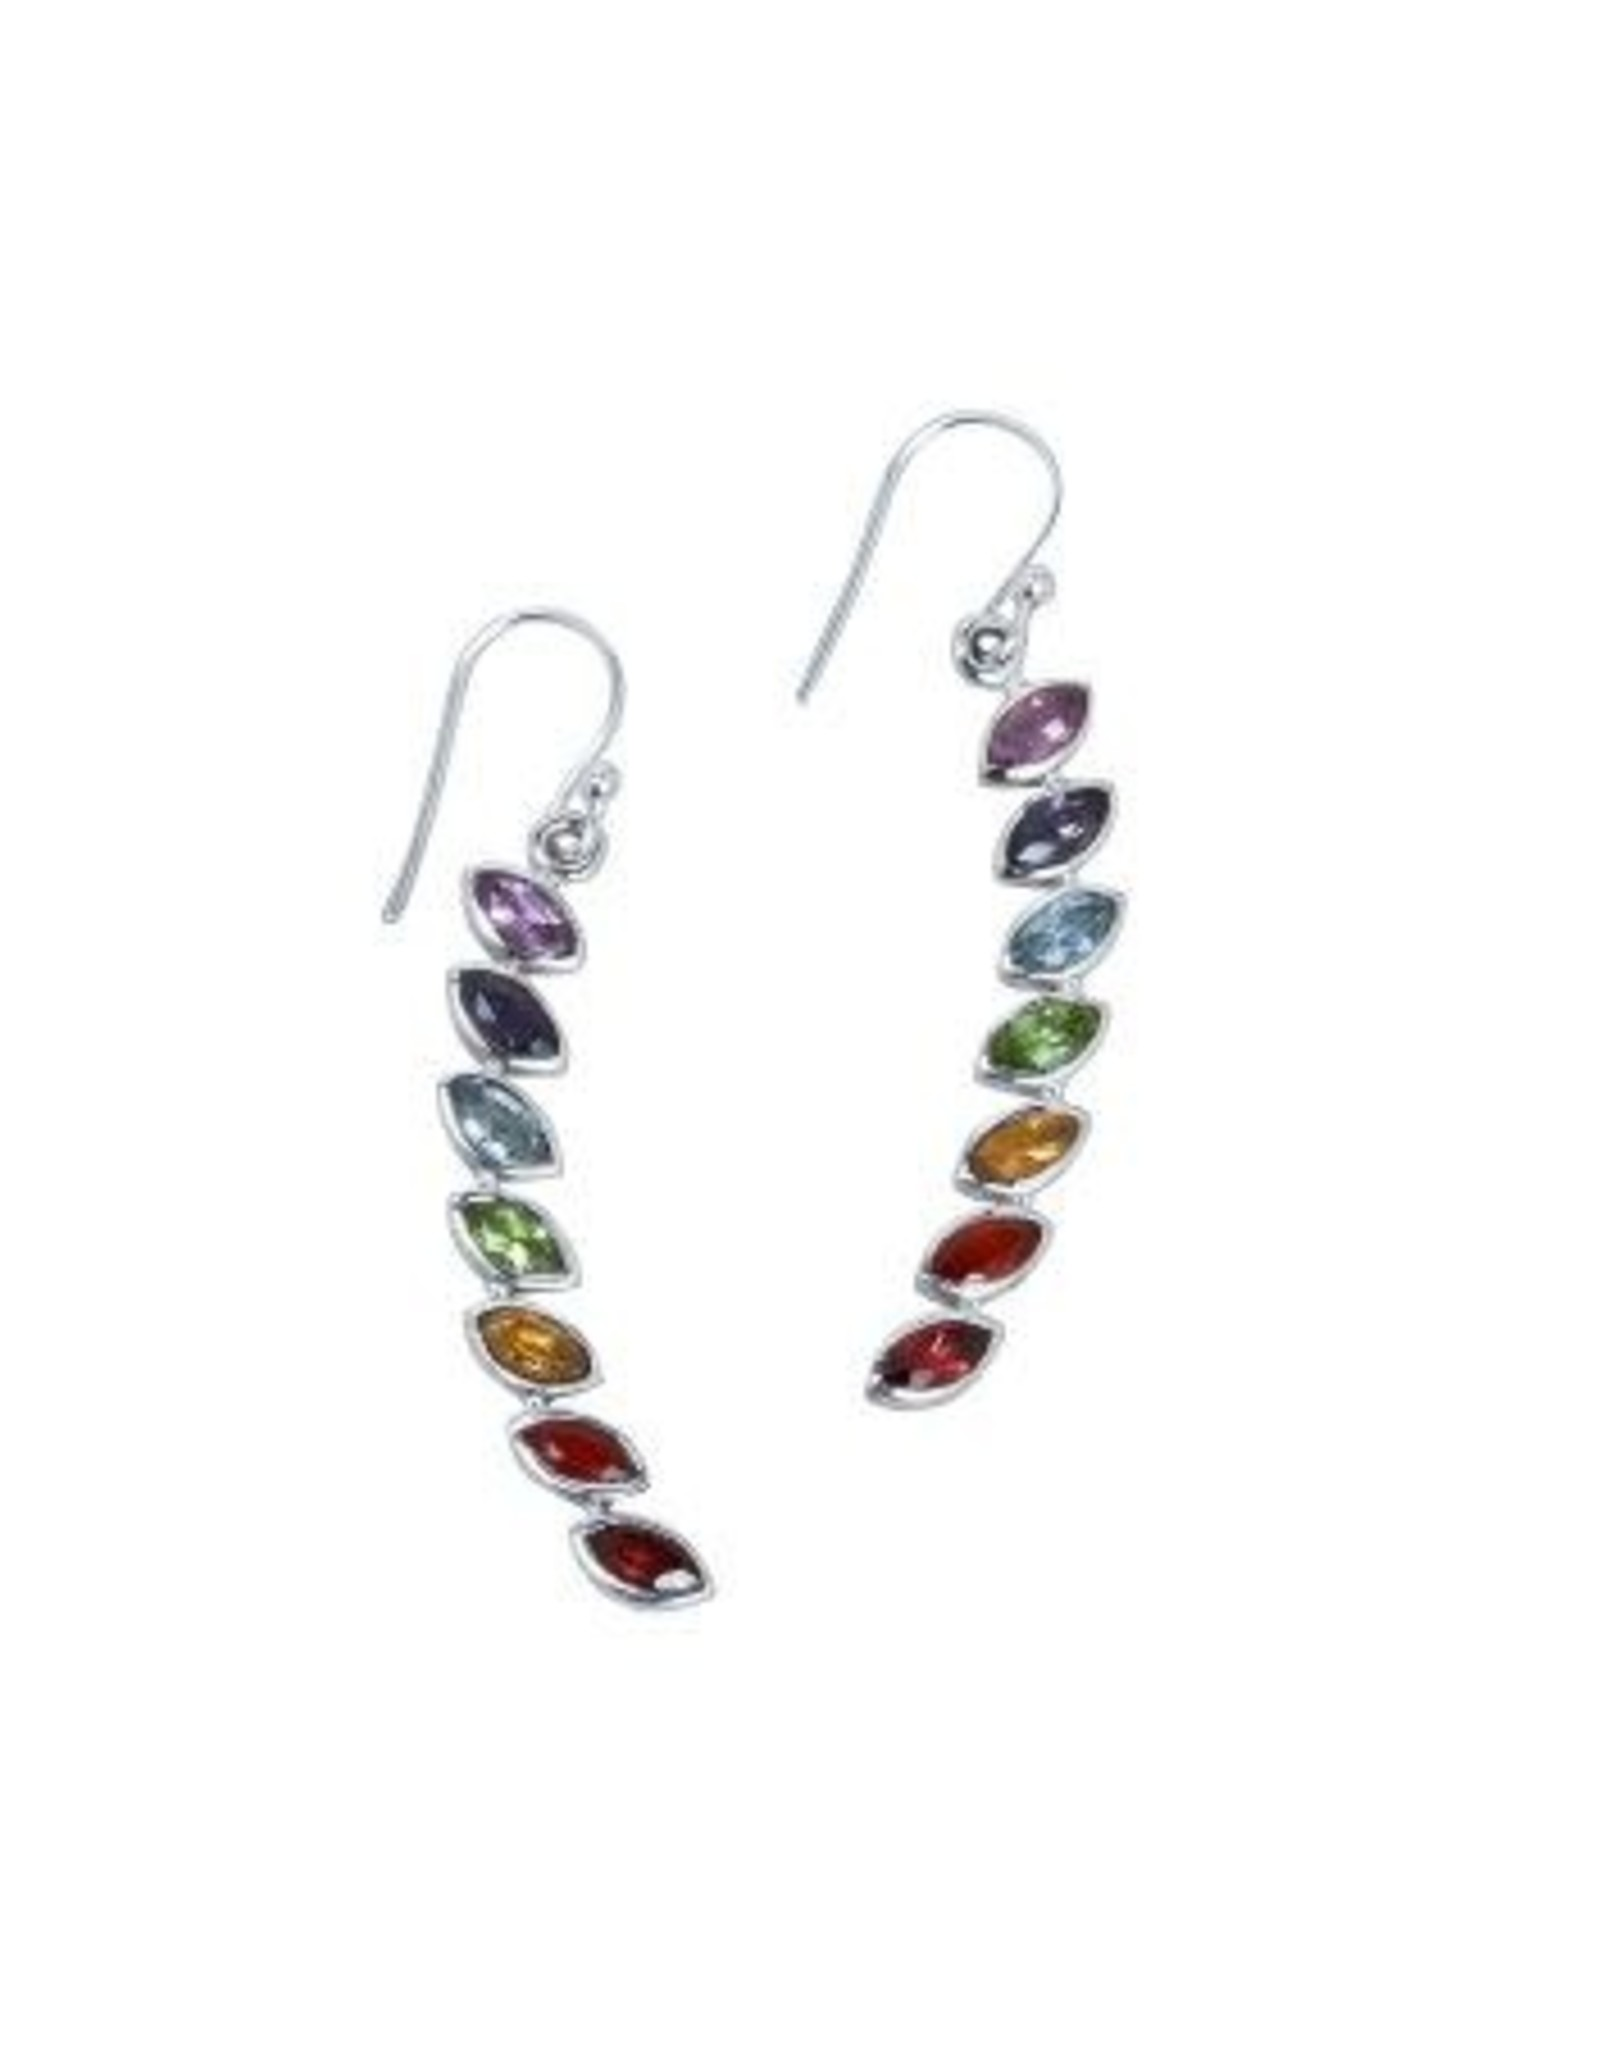 Chakra Stone Earrings, India